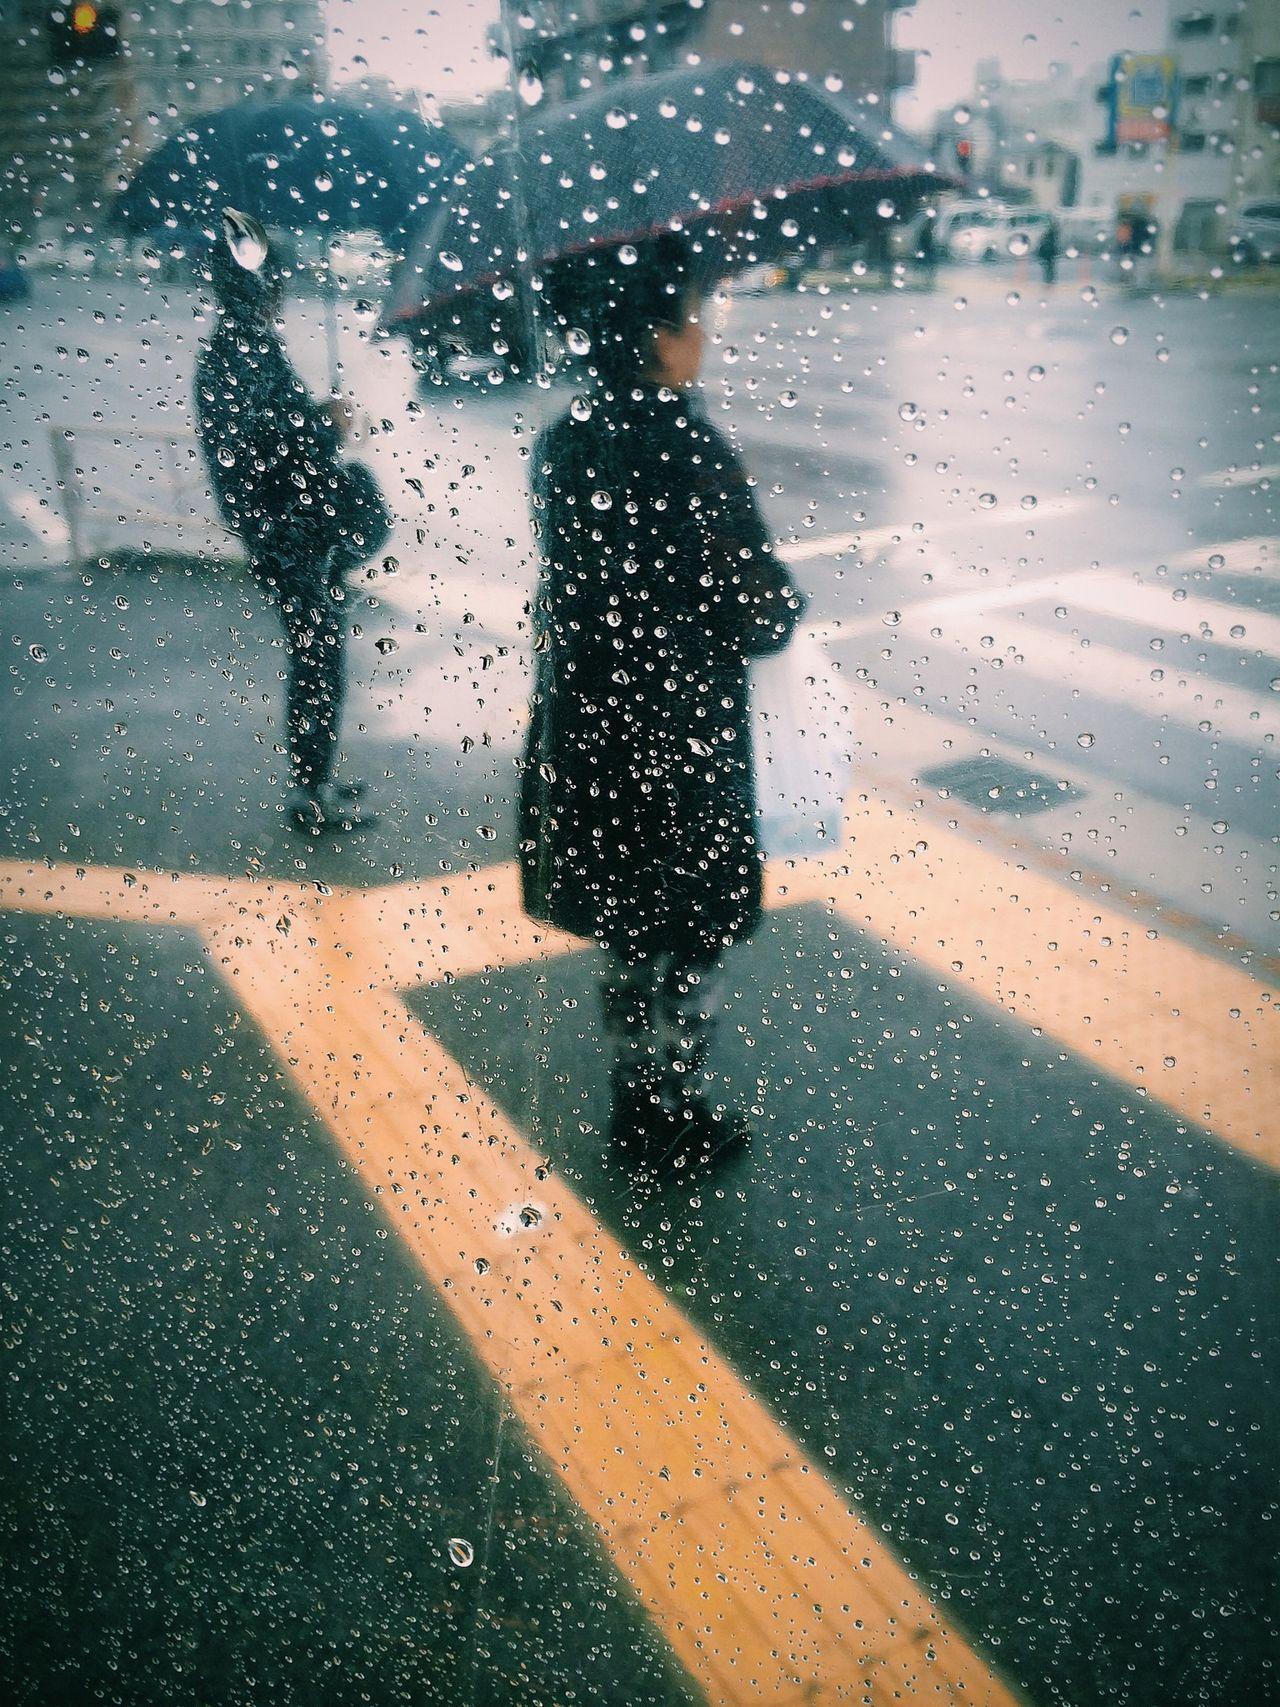 Rainy Days Street Photography